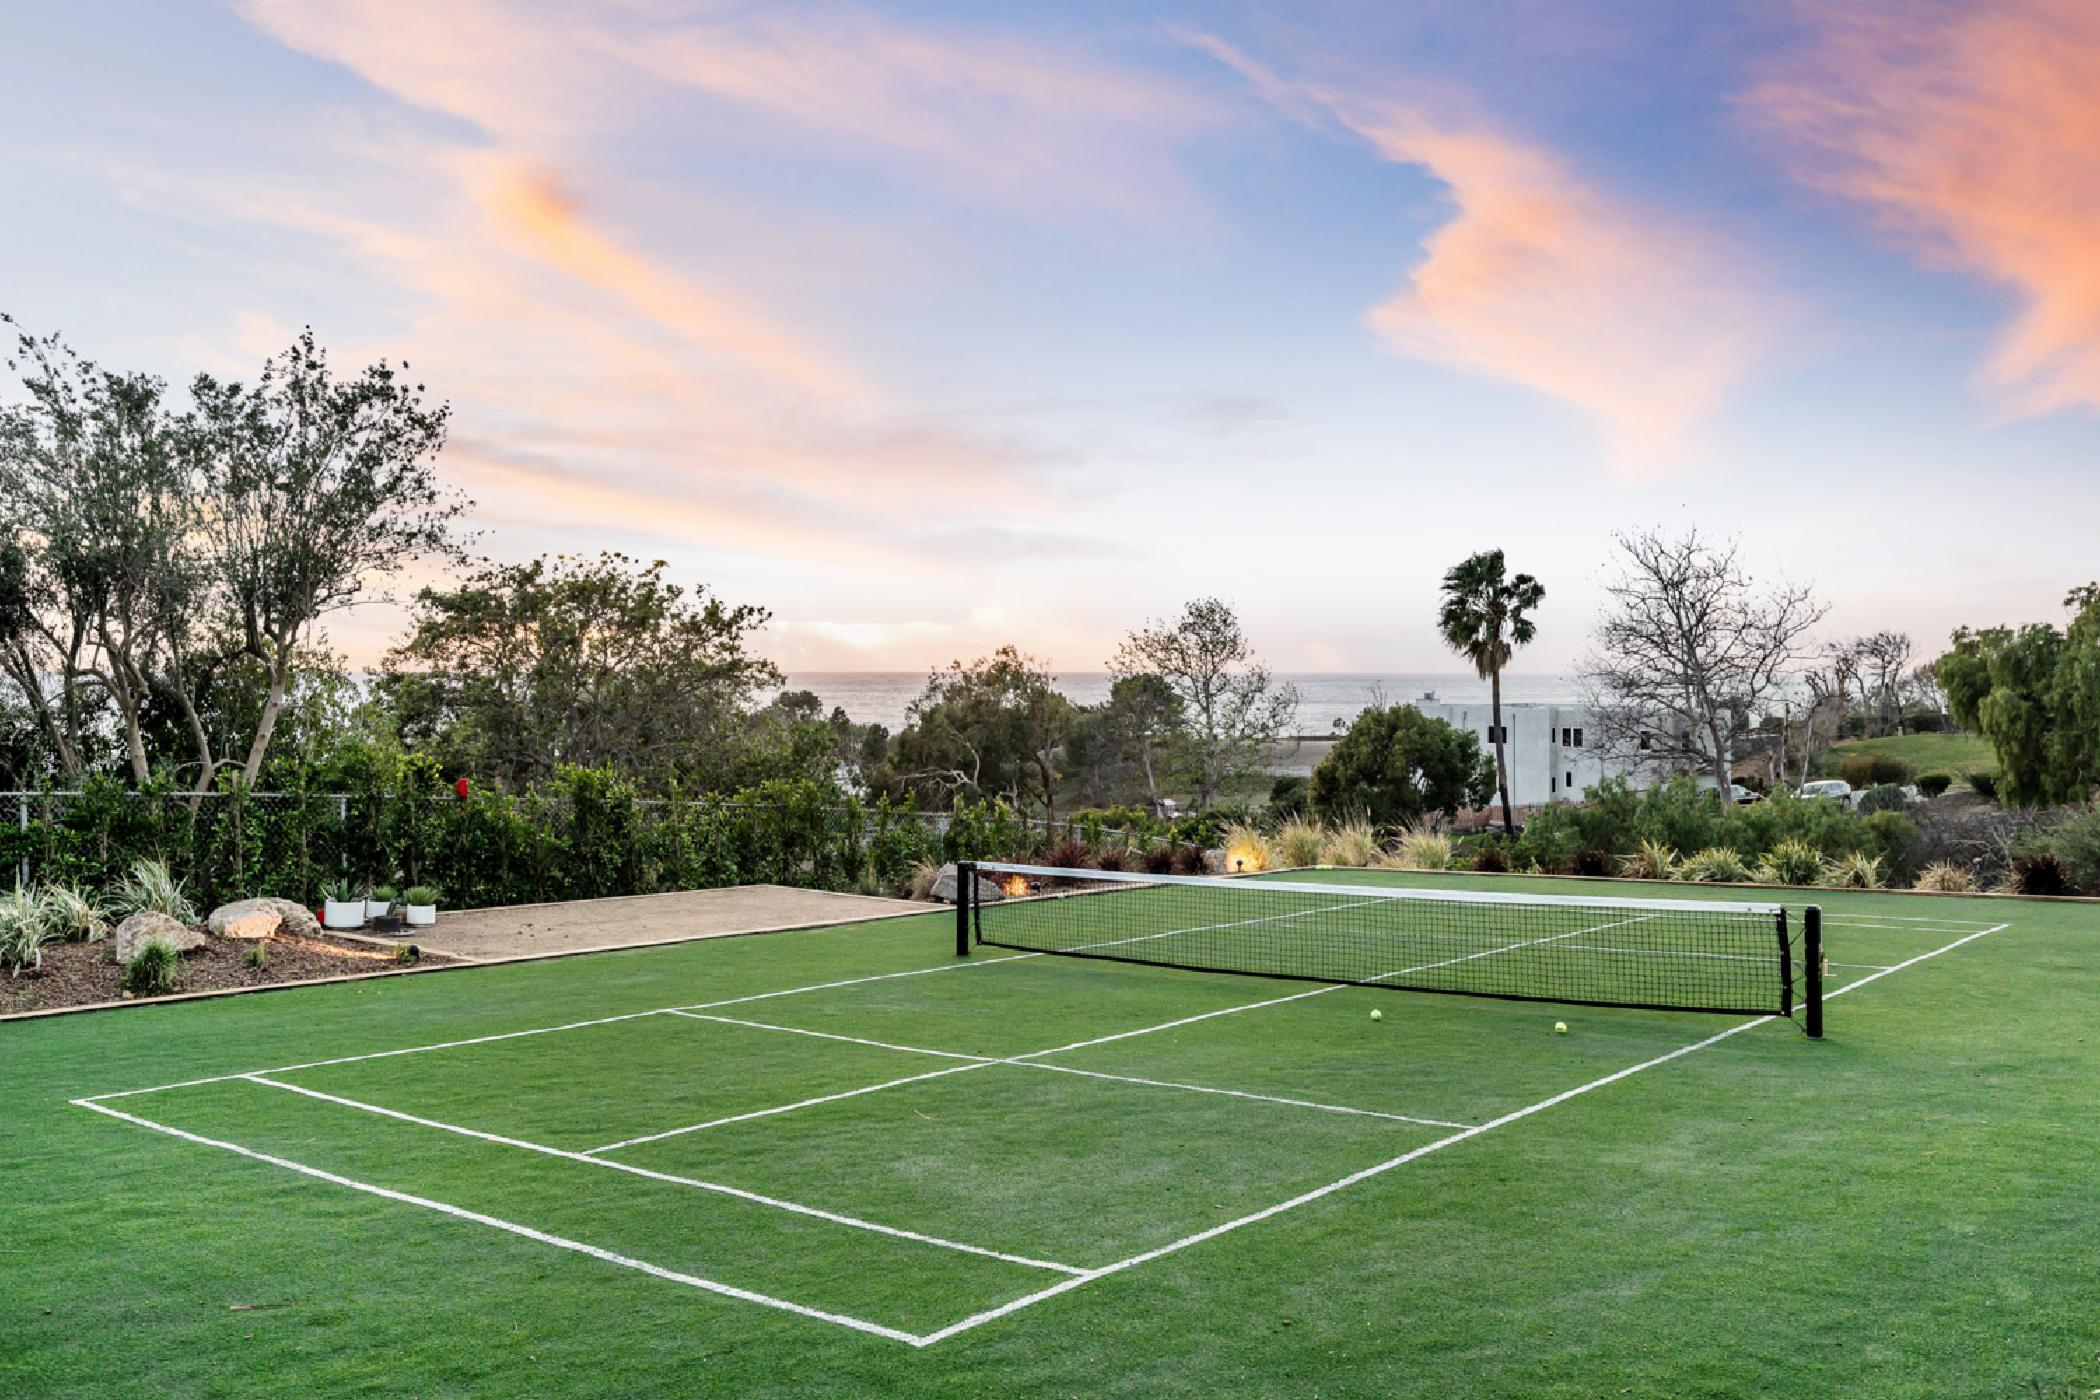 Tennis-court2.jpg